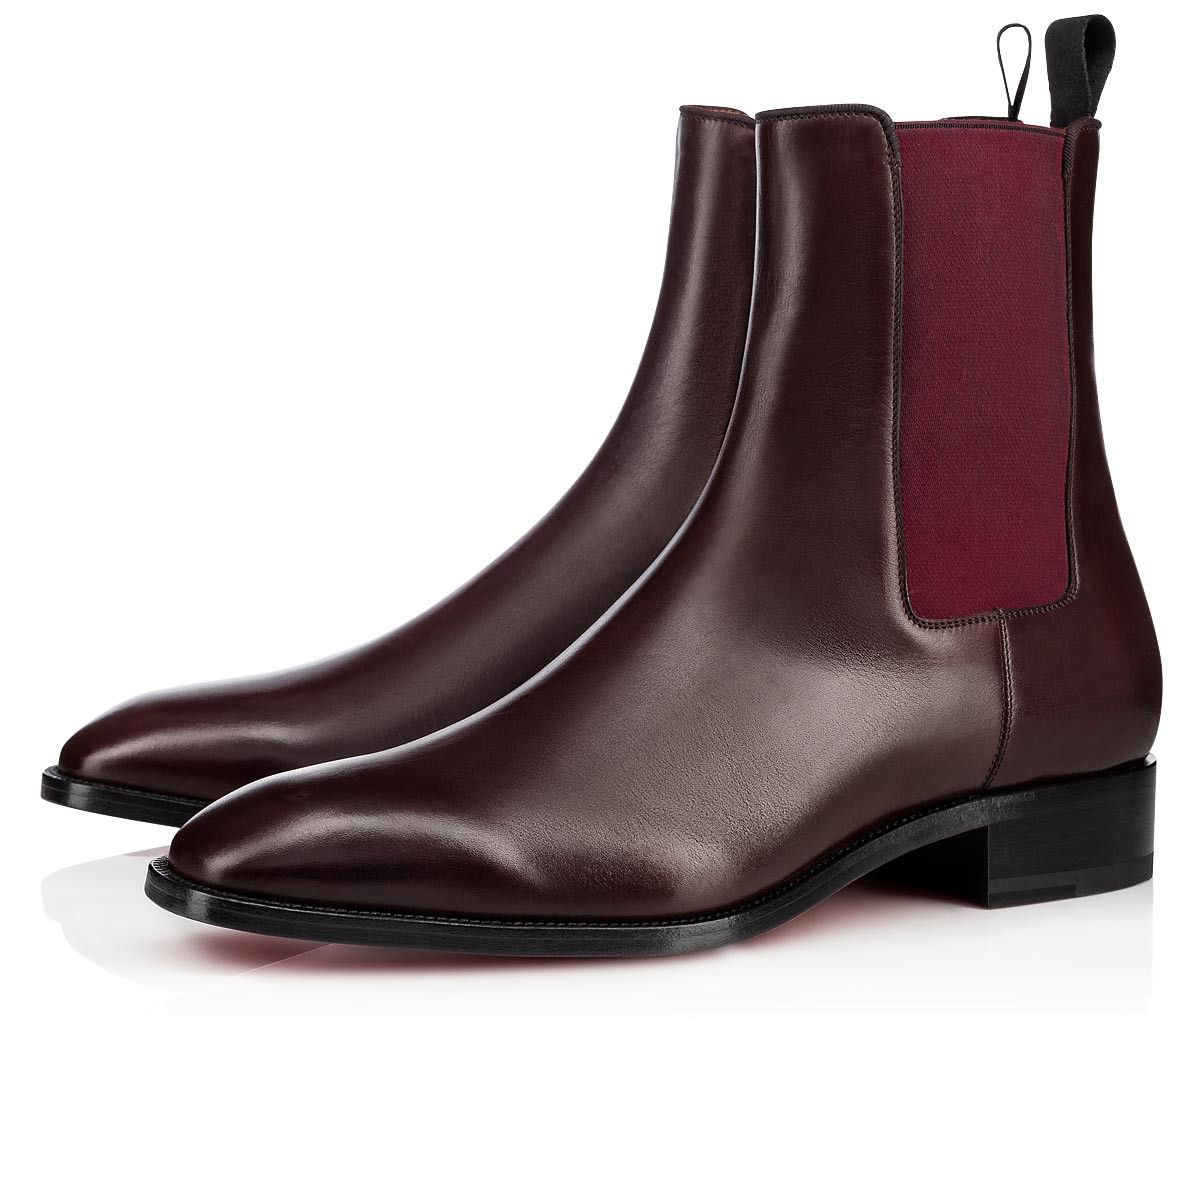 49f6ae78697 CHRISTIAN LOUBOUTIN Samson. #christianlouboutin #shoes # | Christian ...